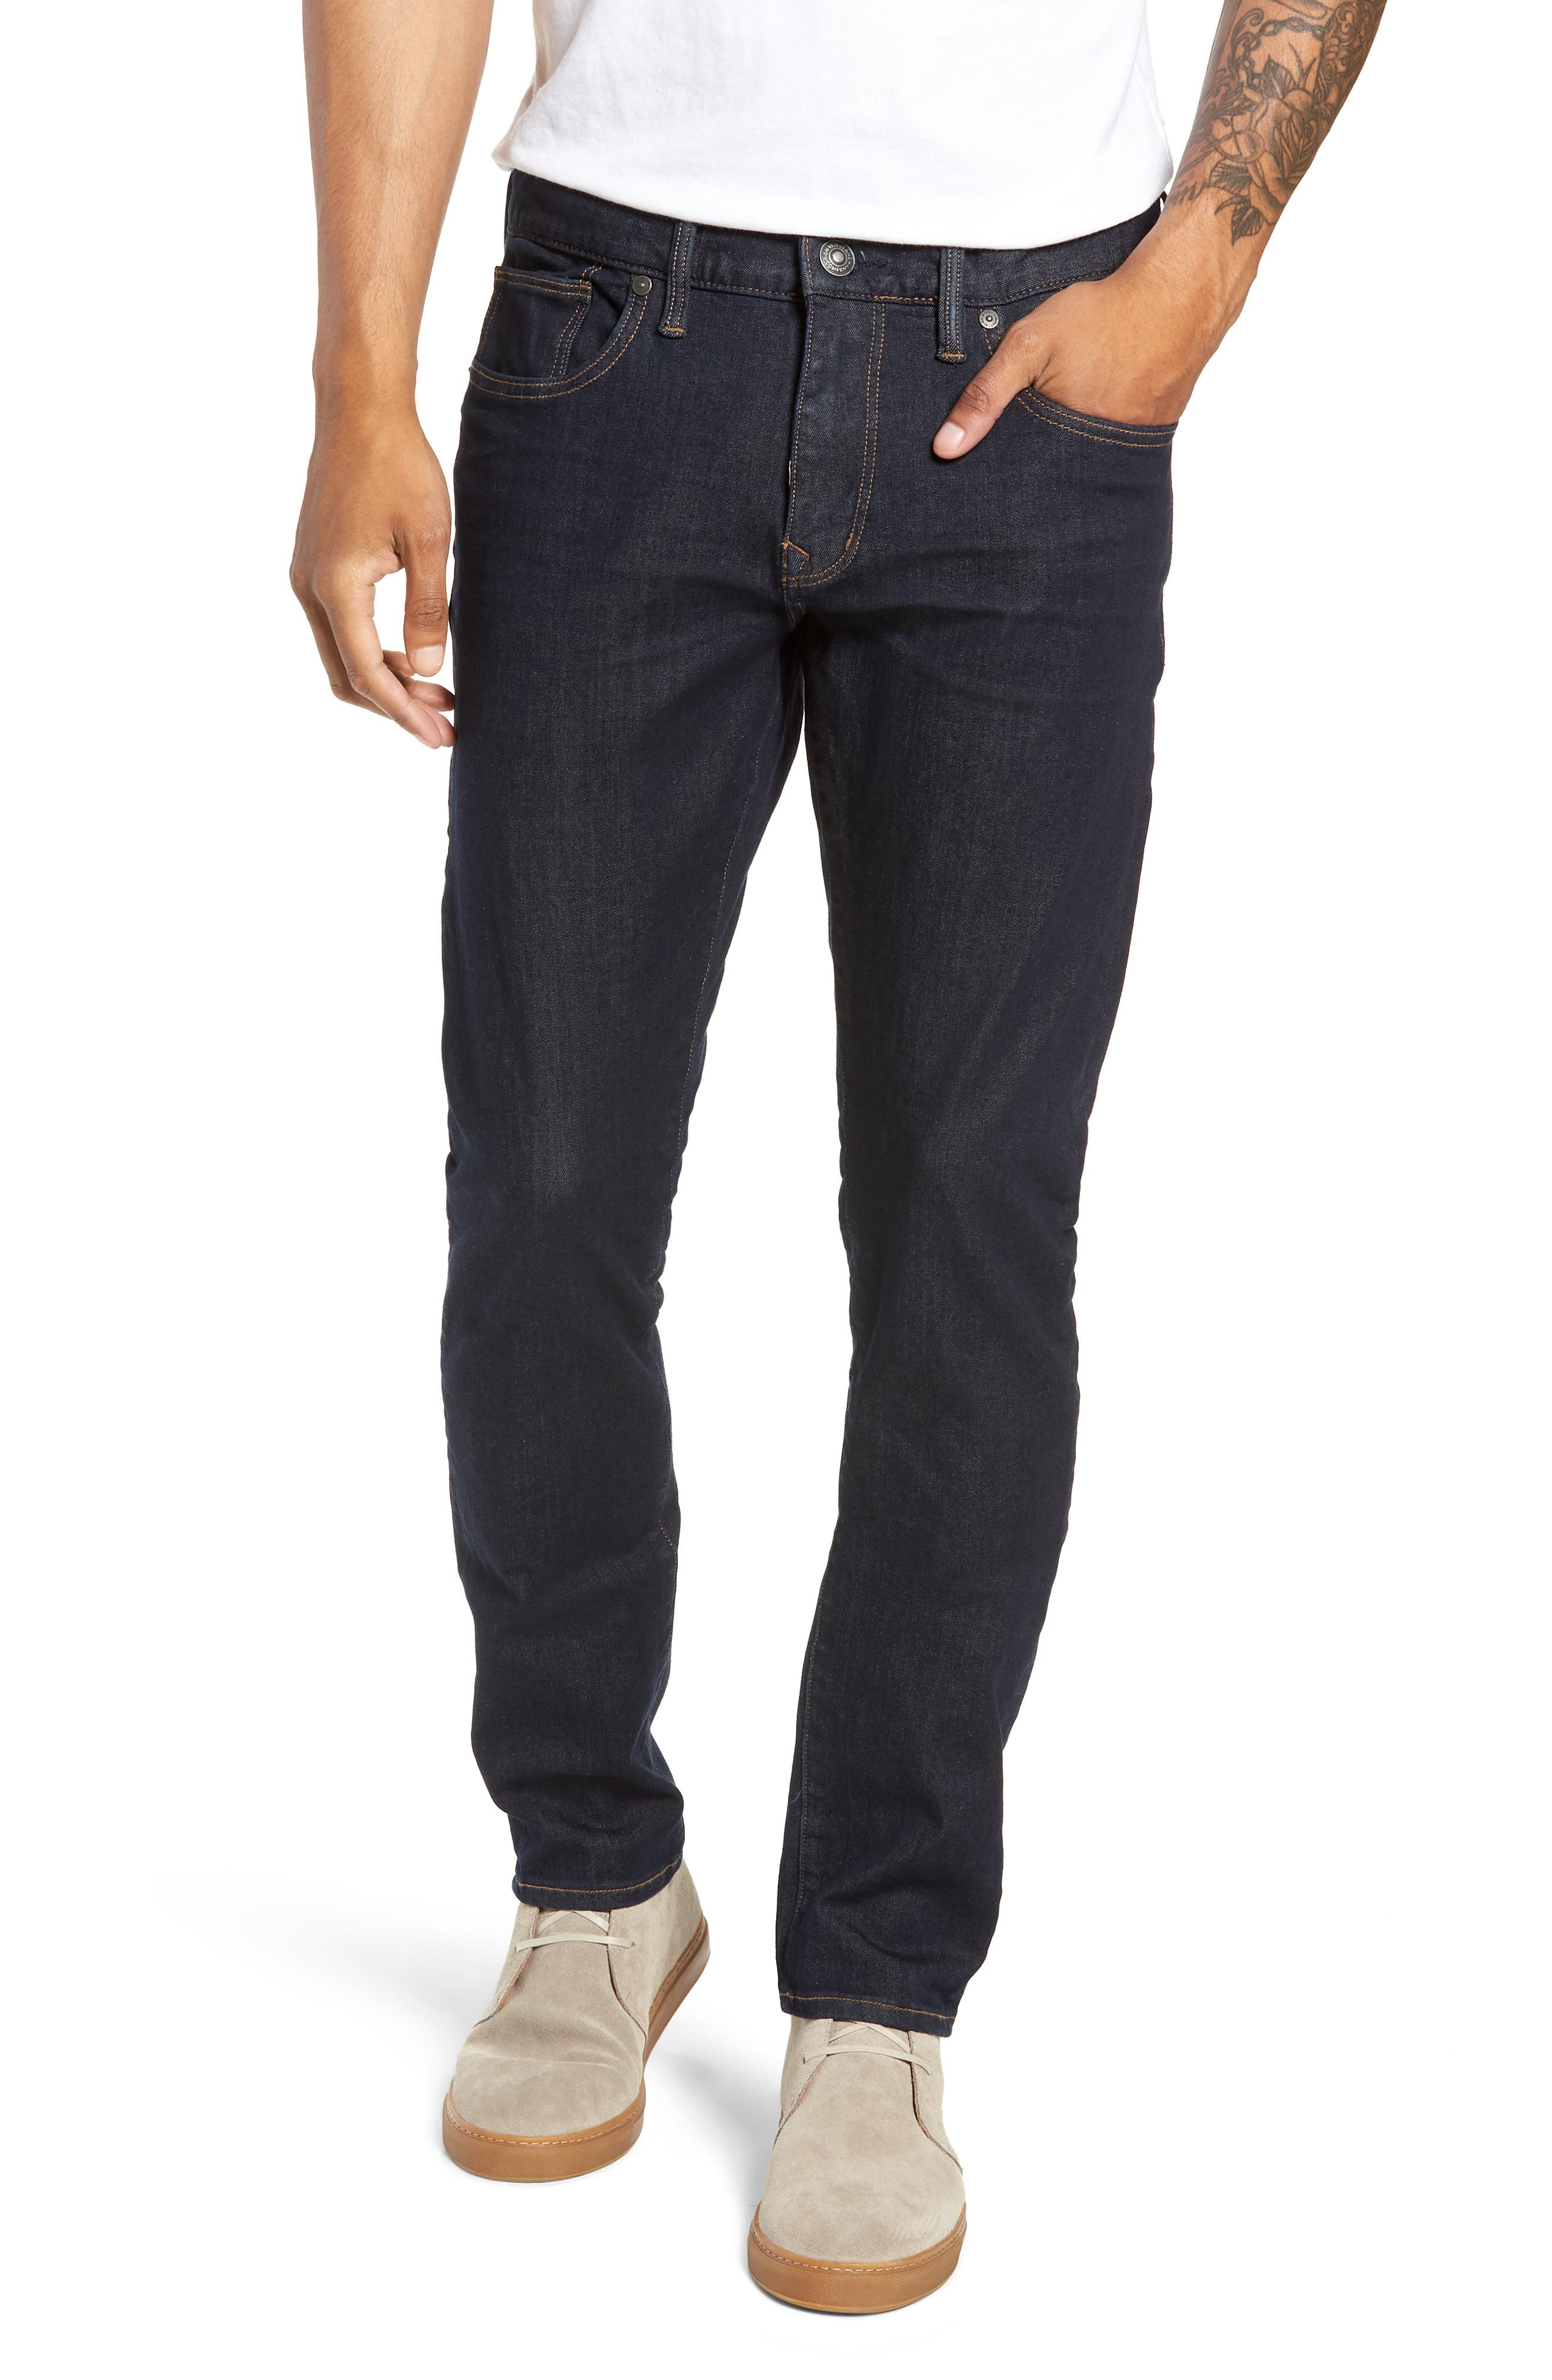 Men's Silver Jeans Co. Ashdown Slim Straight Leg Jeans